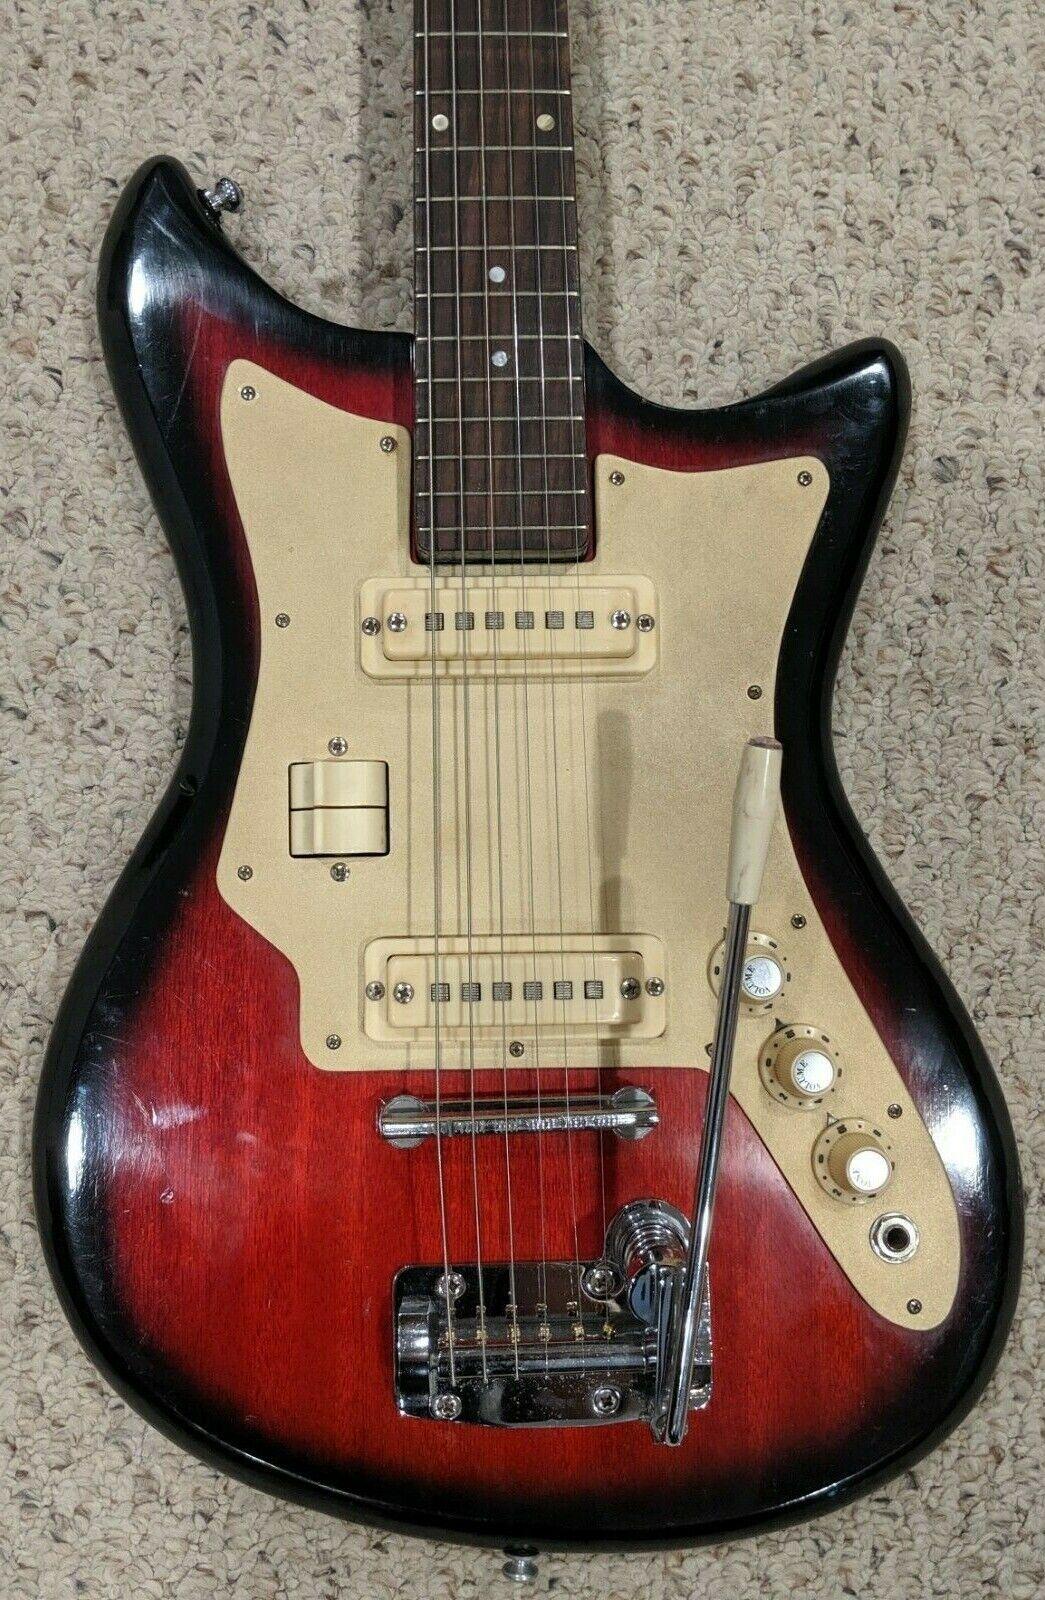 Vintage Pleasant  Lafayette Electric Guitar - 1960's - Plays and Sounds Superb